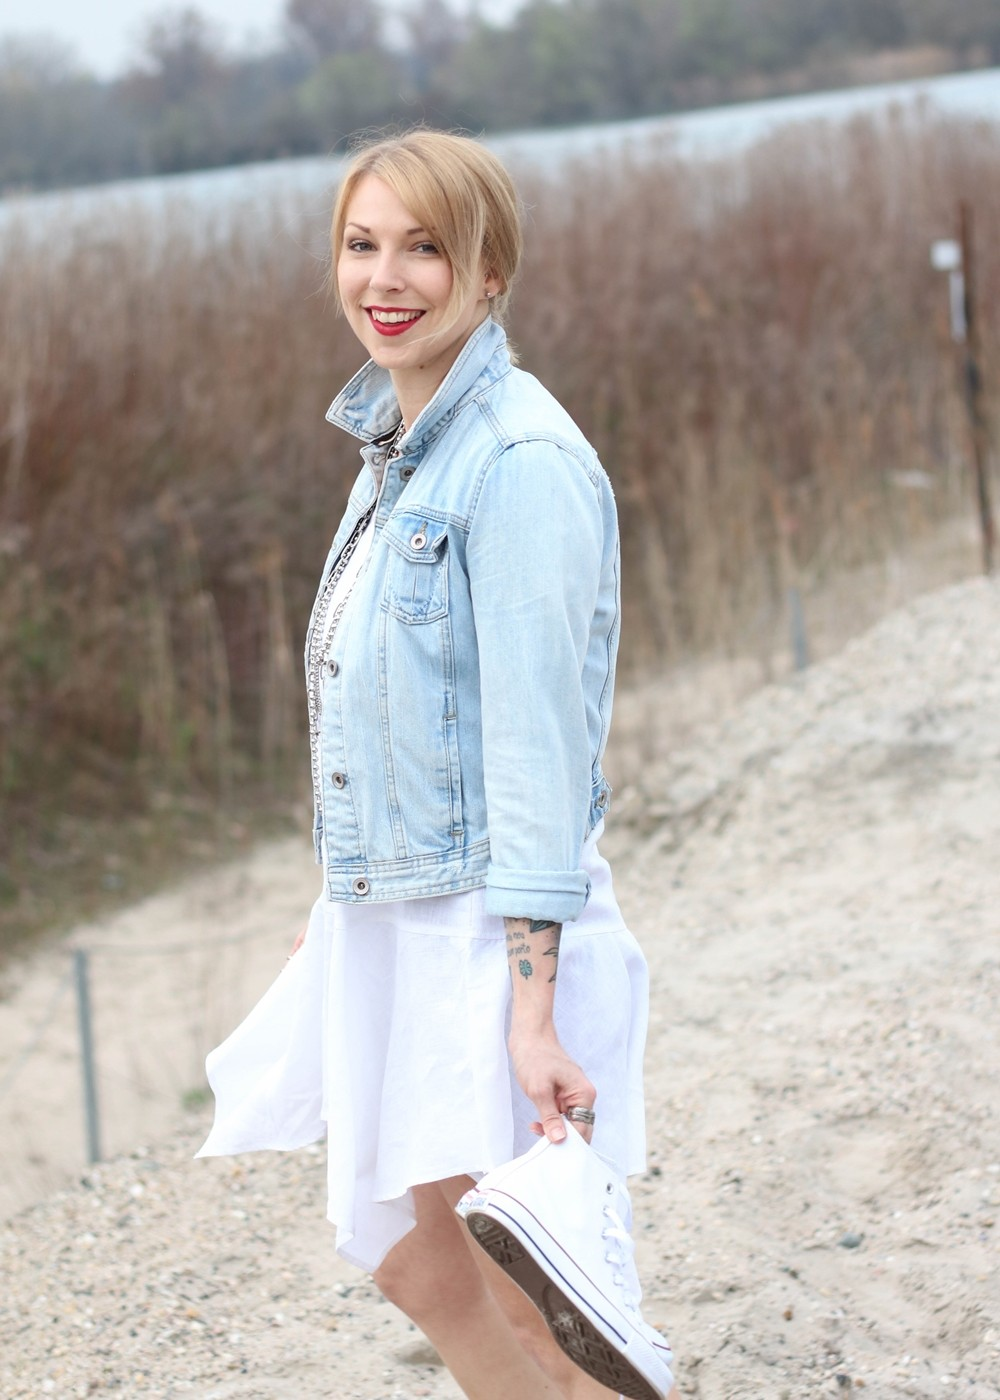 Fashionblogger Karlsruhe Outfit Strand weisses Kleid Jeansjacke Lederchucks (8)